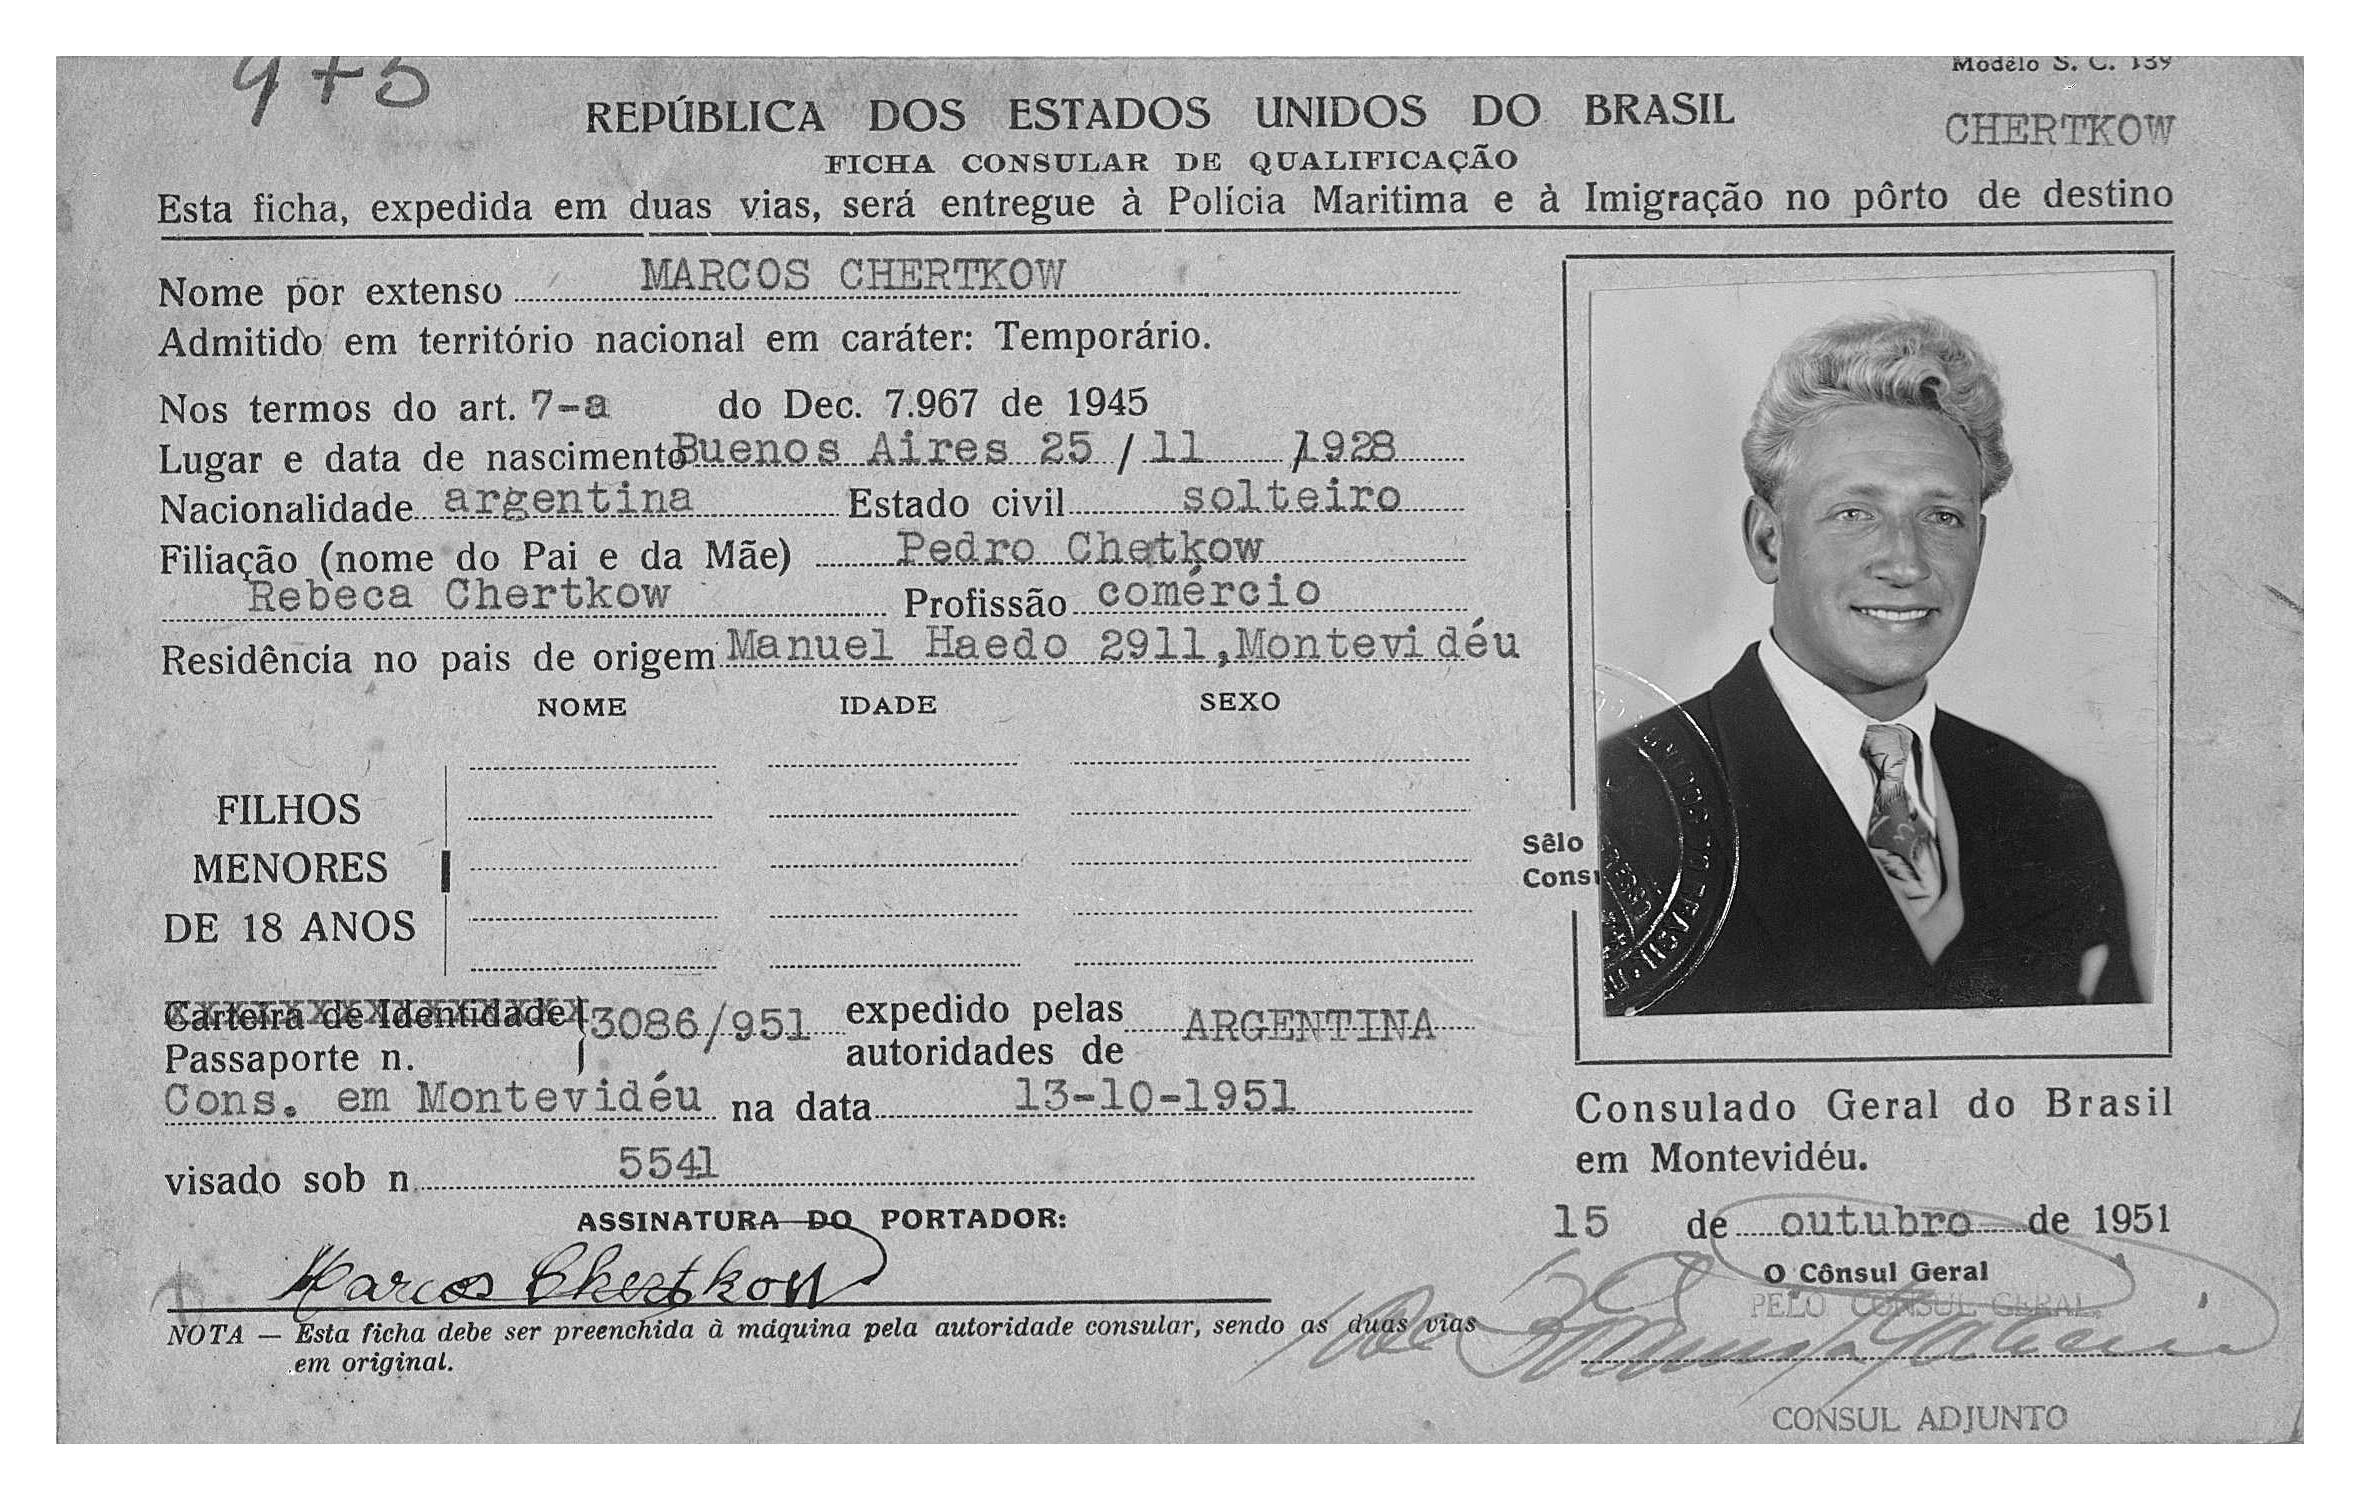 Marco-1951-10-ficha-consular-RJ-01-copy1.jpg